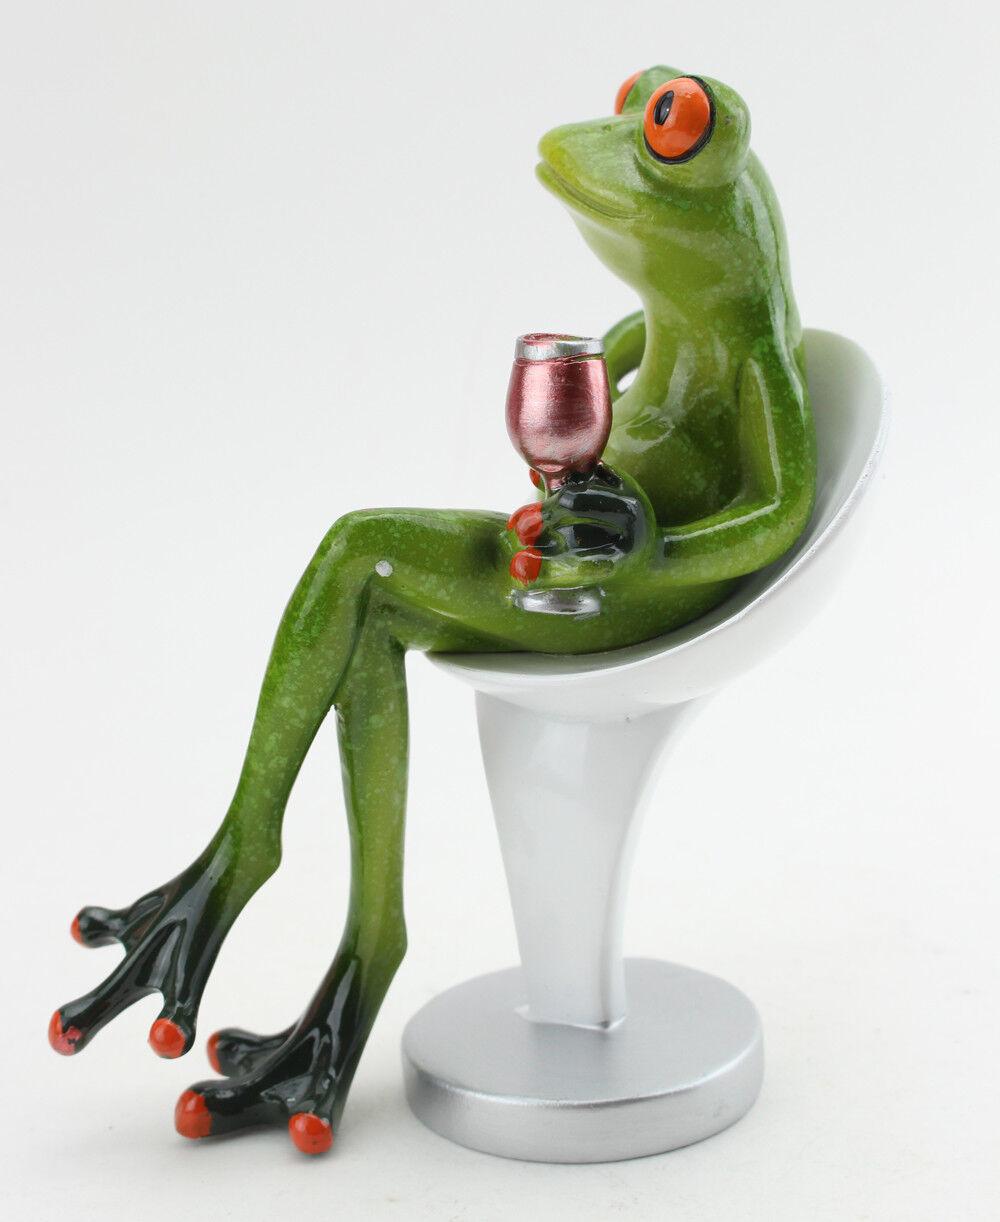 Meditating or Praying Frog Figurine eyeglasses holder *New*